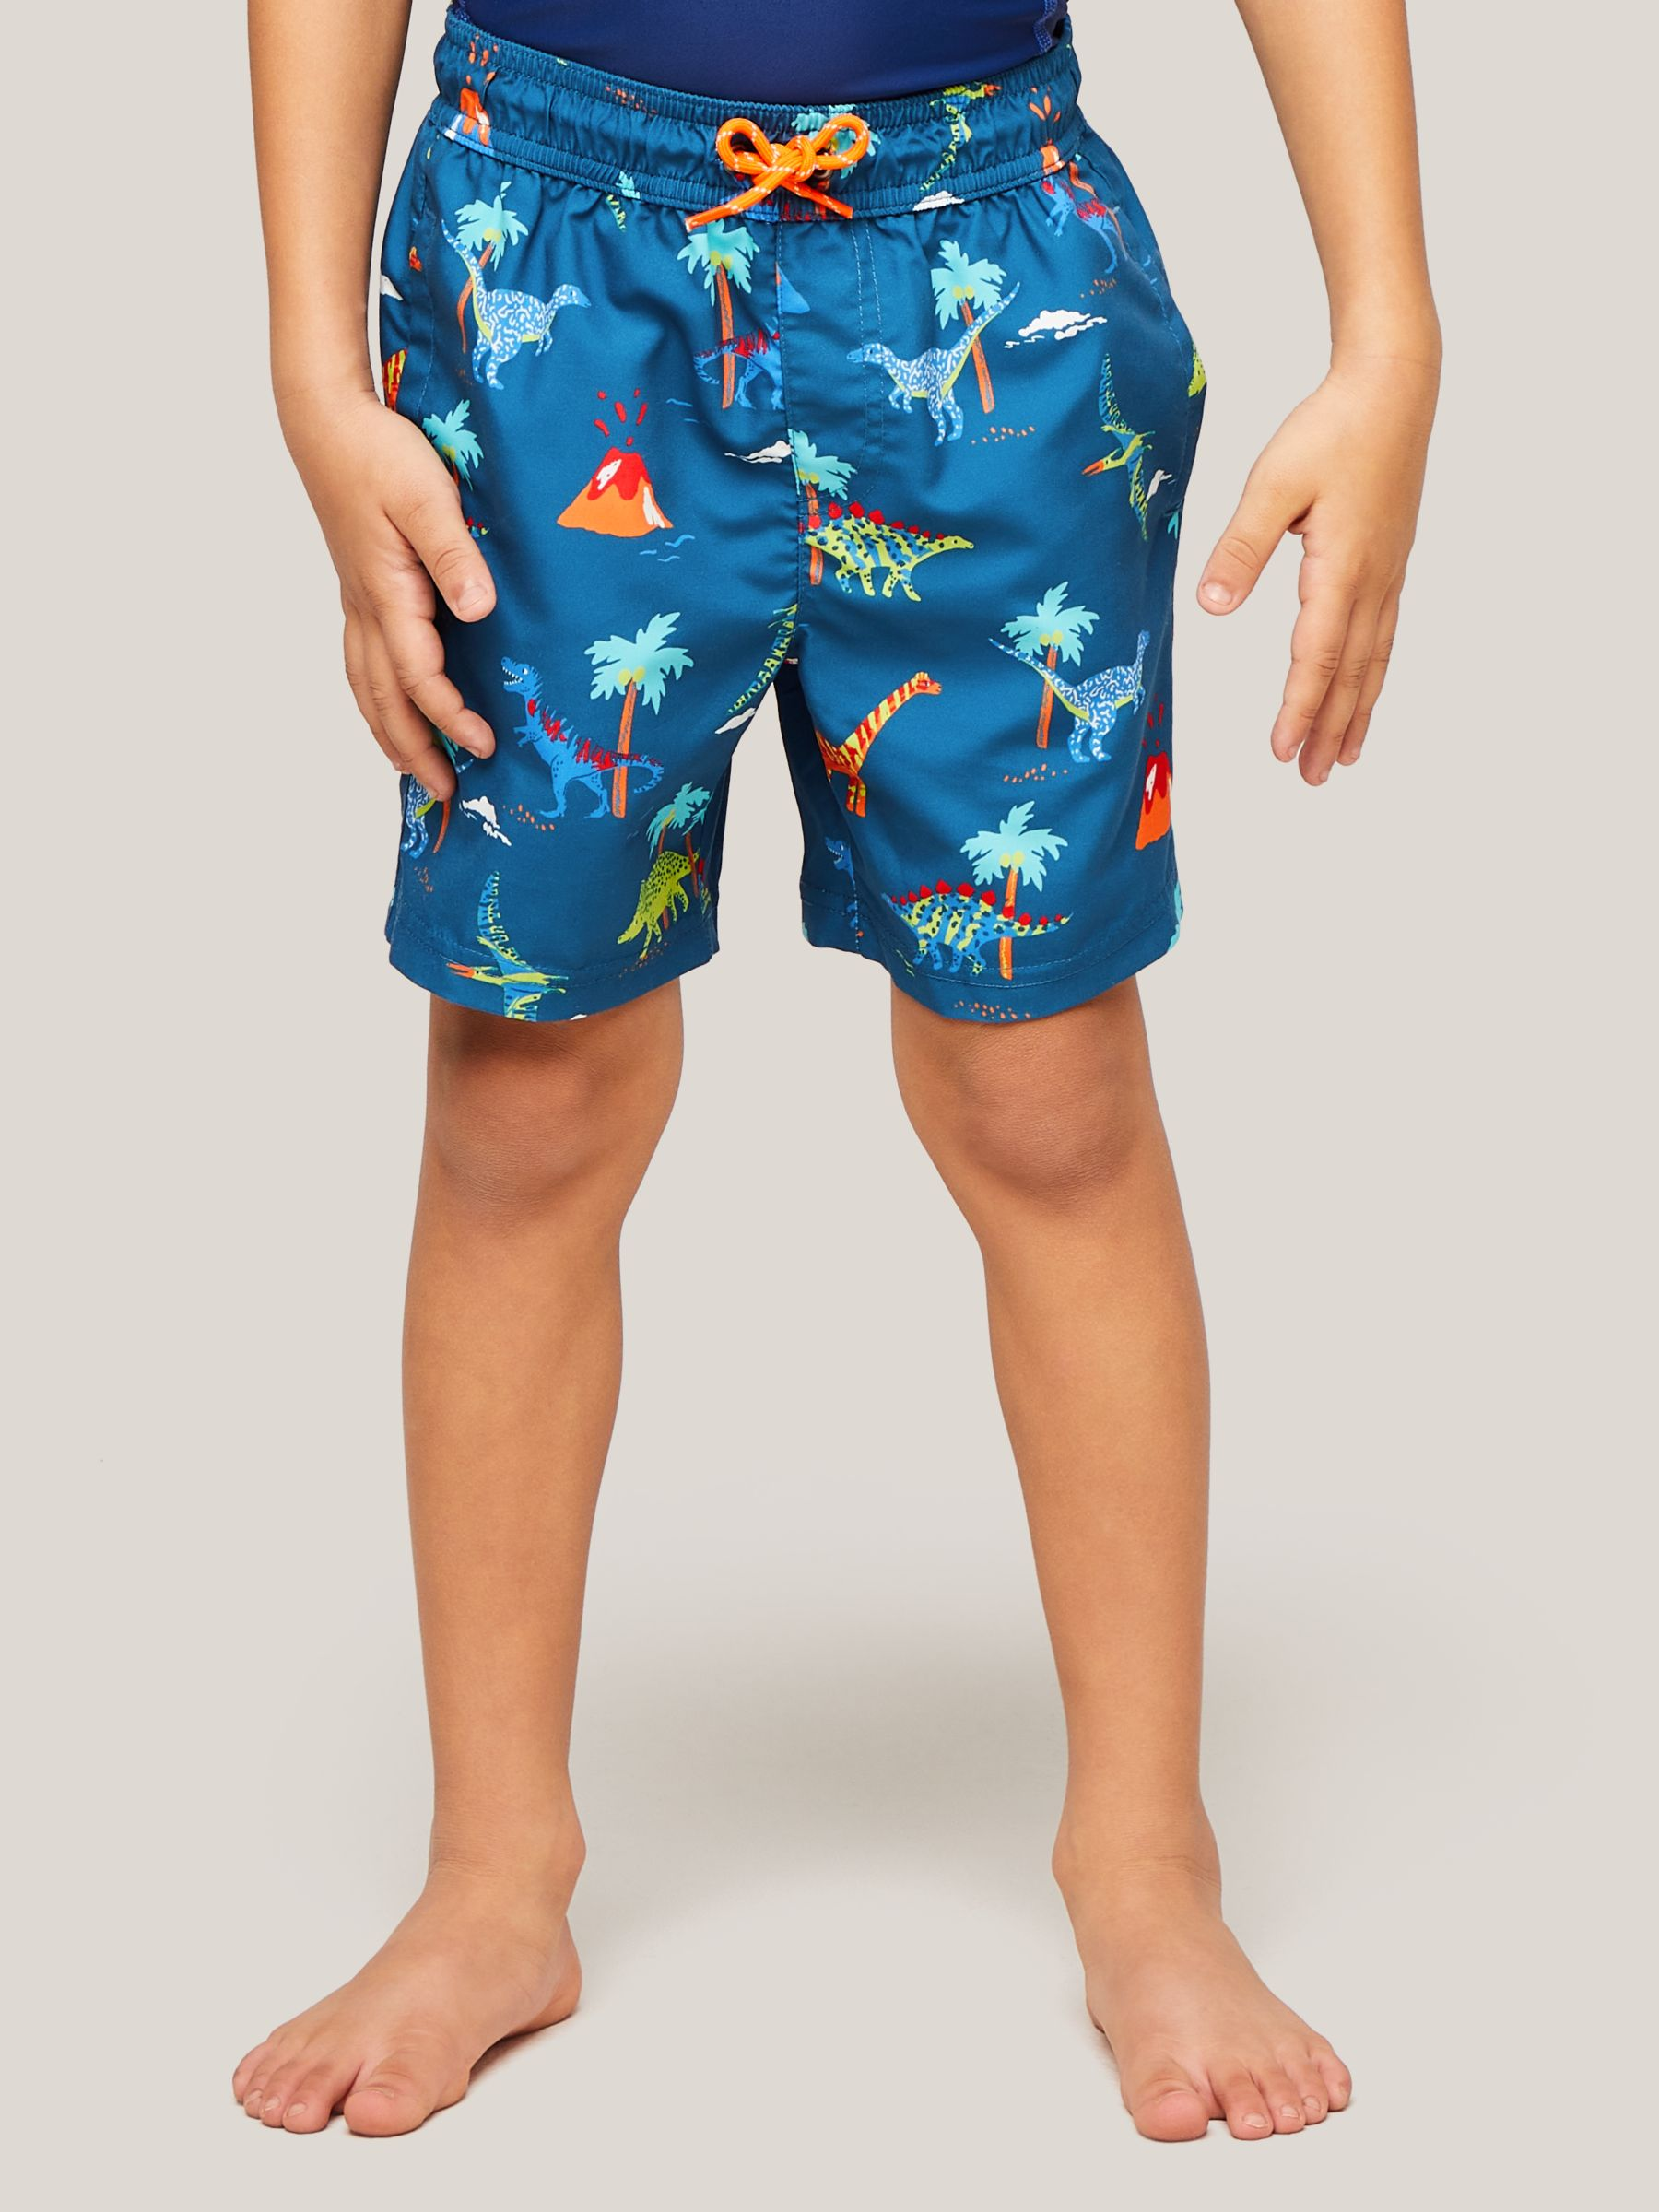 Lovely Boys Speedo Swimming Shorts Age 6-7 Years